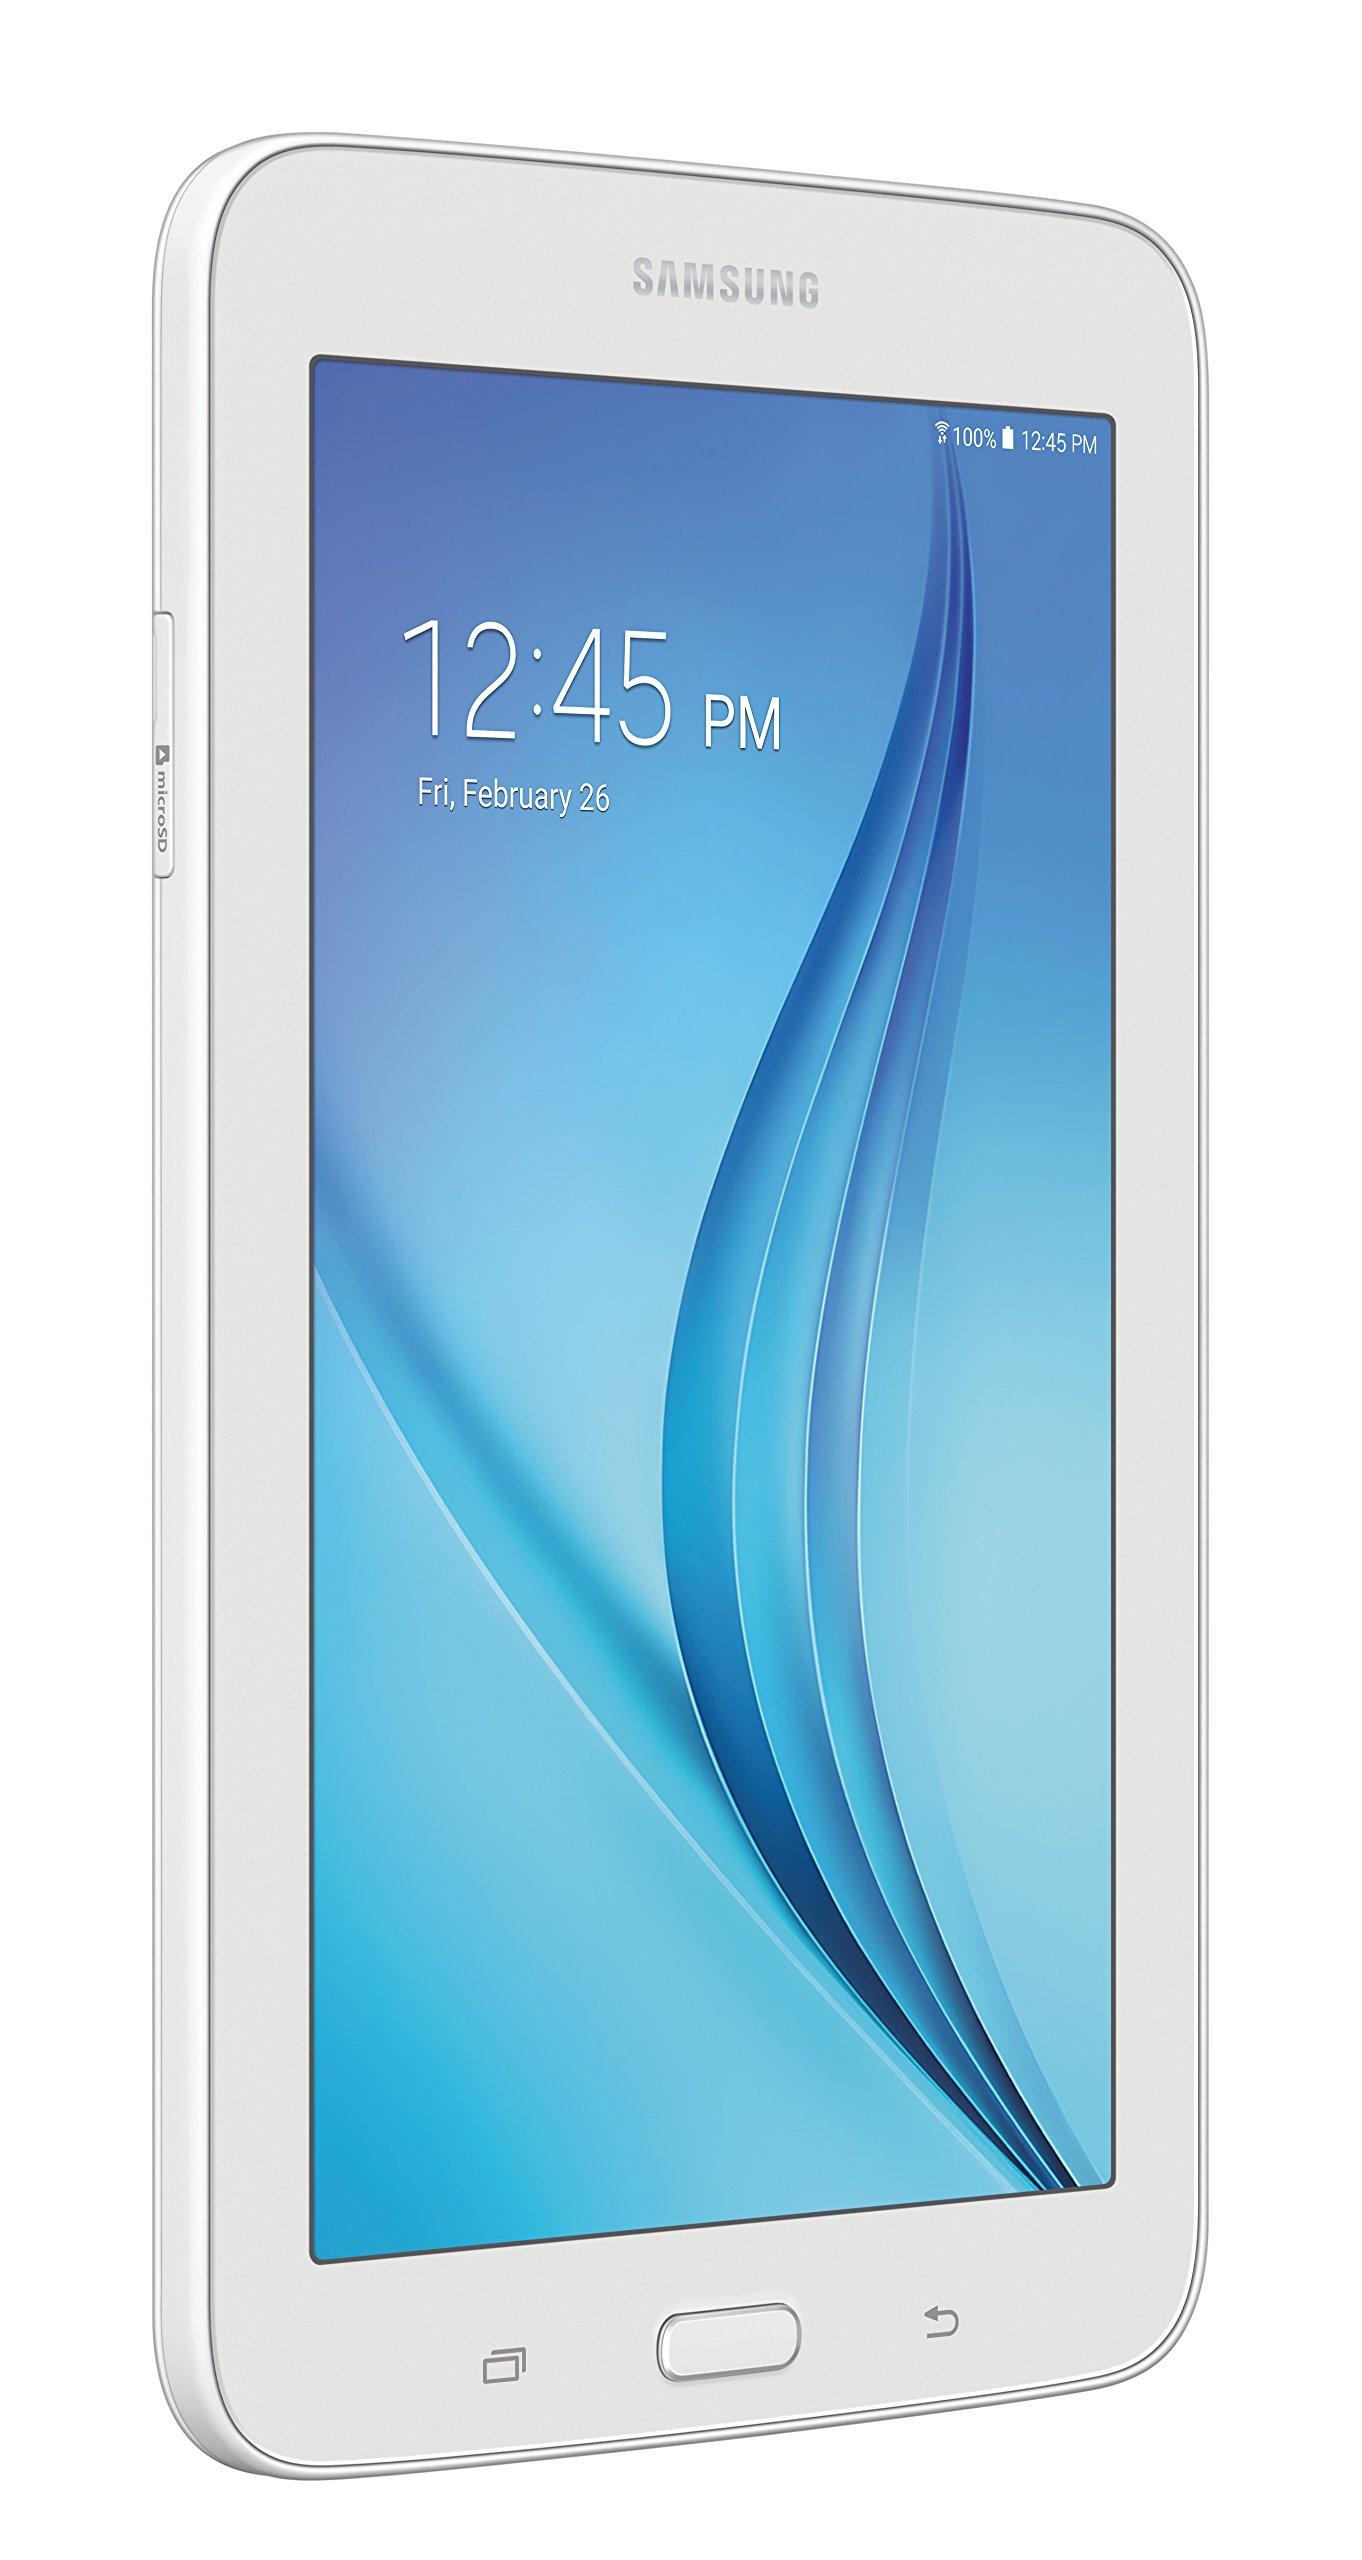 Samsung Galaxy Tab E Lite 7''; 8 GB Wifi Tablet (White) SM-T113NDWAXAR by Samsung (Image #2)